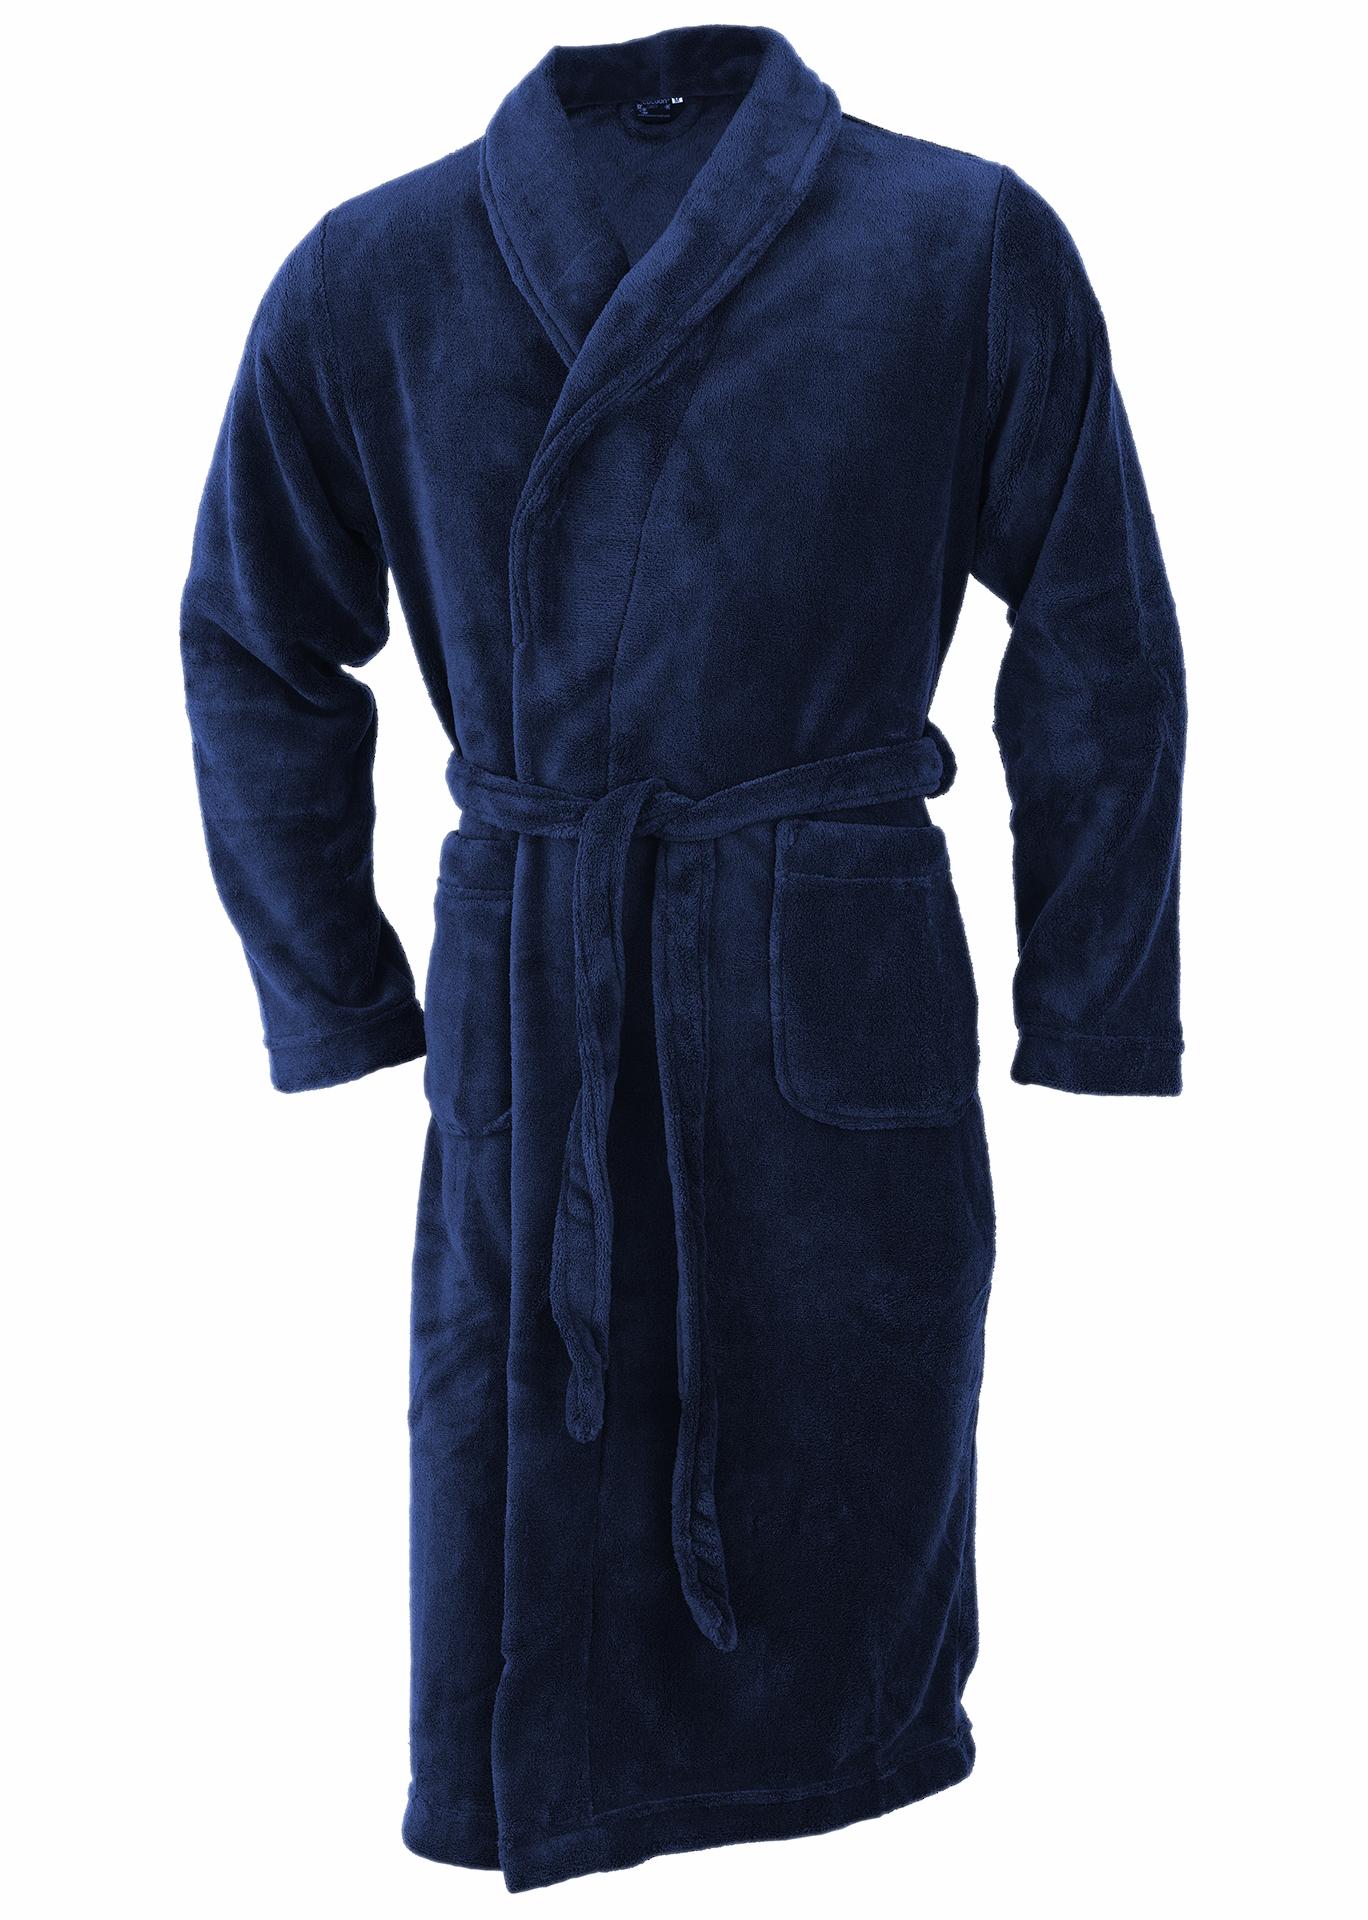 Bath Robes Comfort navy blue